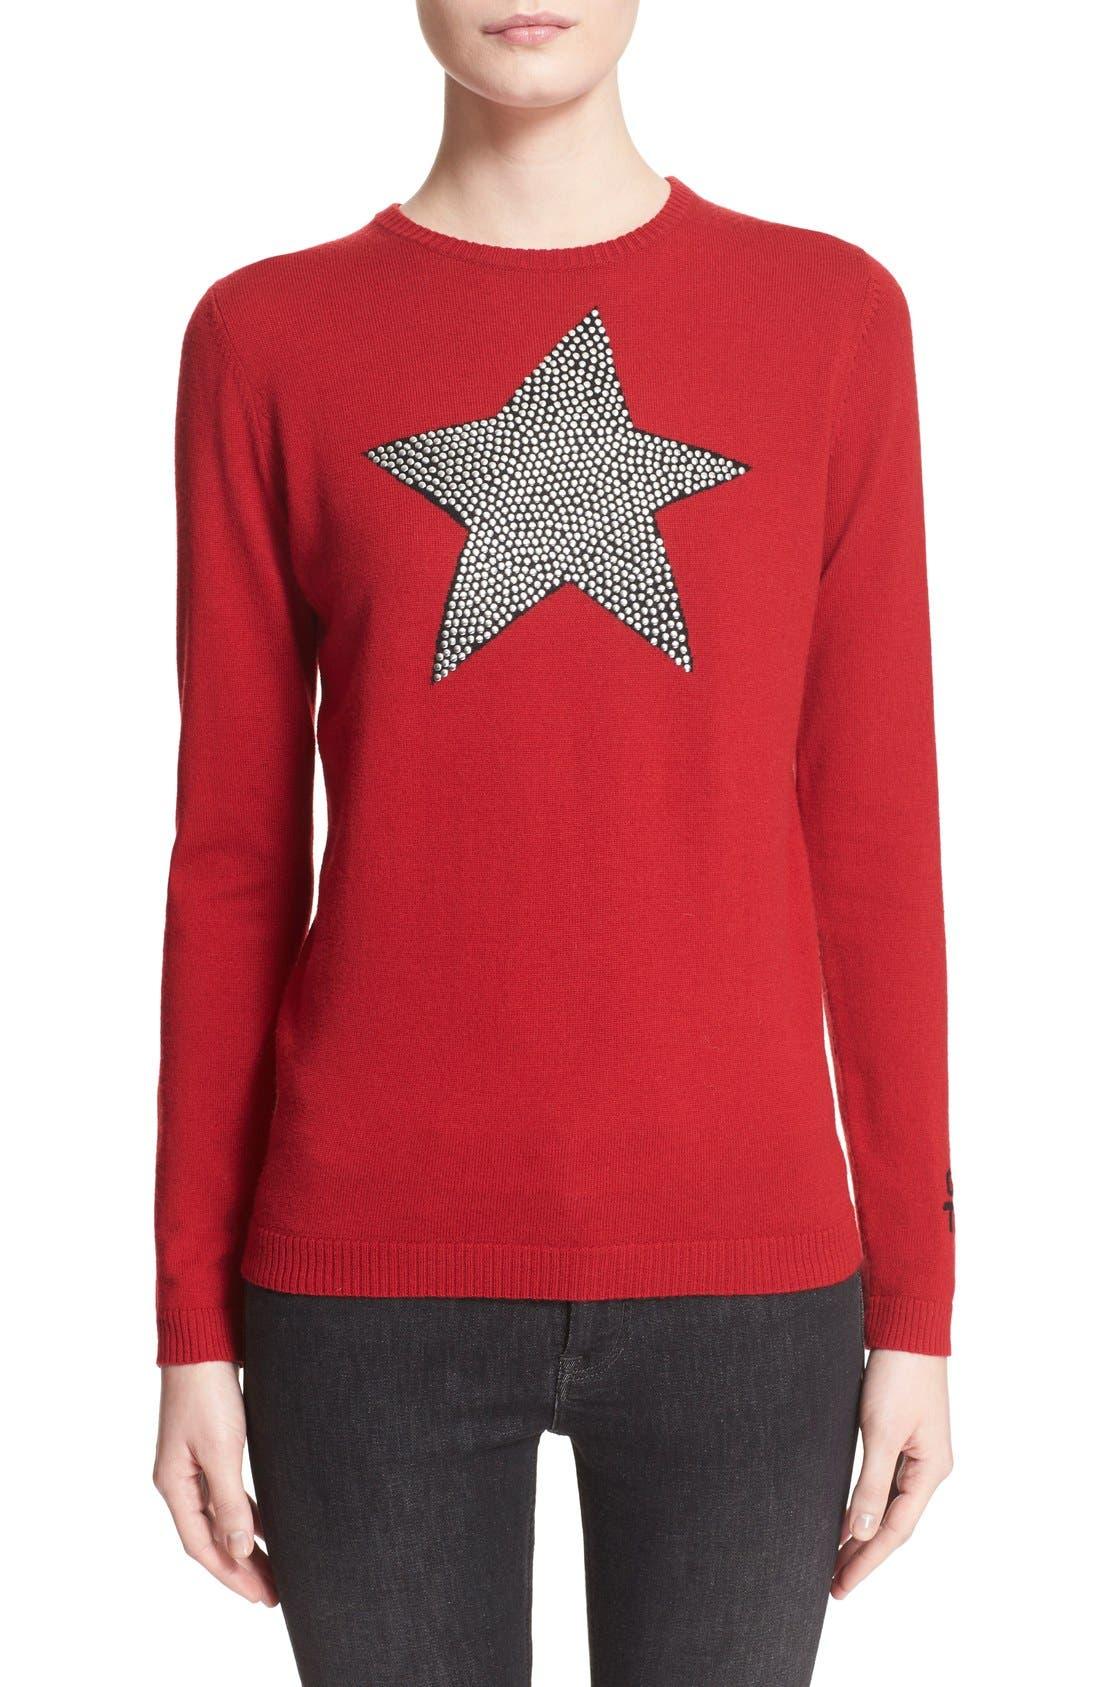 Main Image - Bella Freud 'Star Studded' Crewneck Wool Sweater